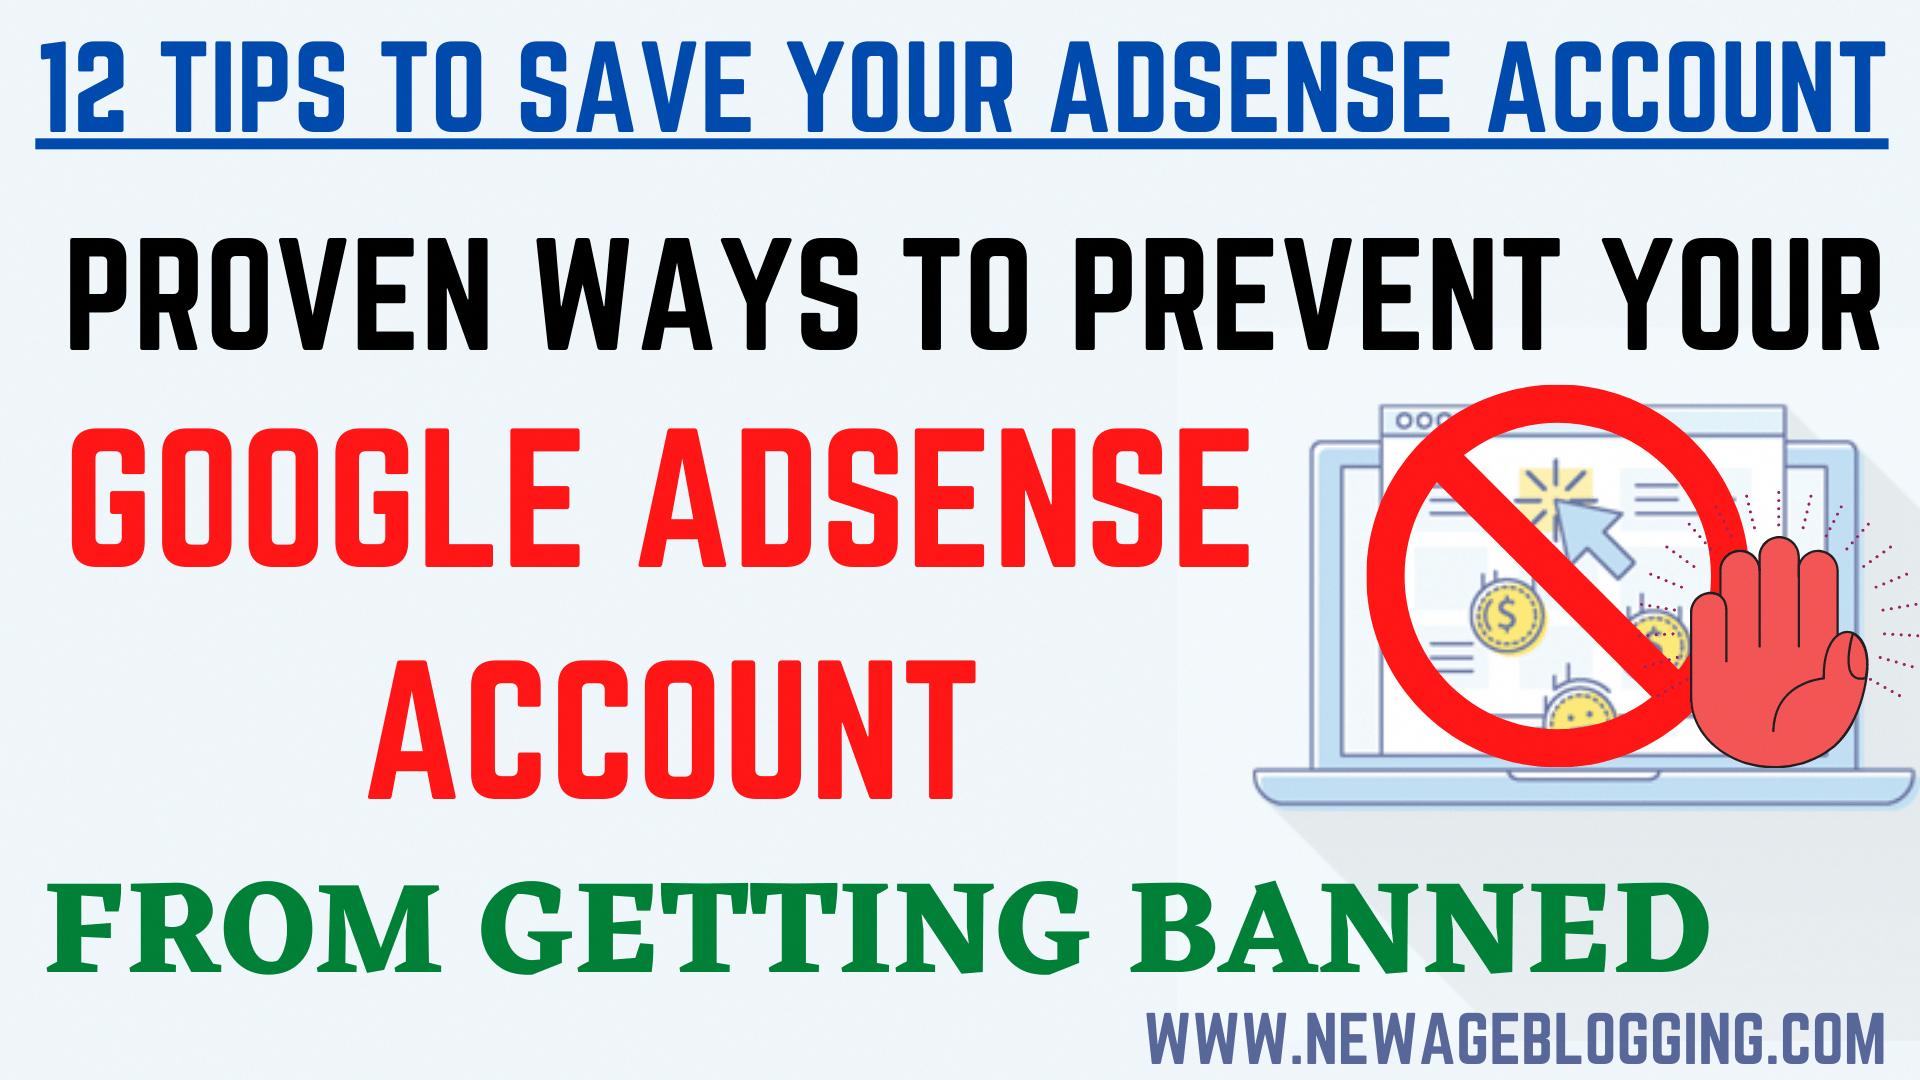 Google Adsense Income Tax Canada In 2020 Adsense Google Adsense Adsense Earnings